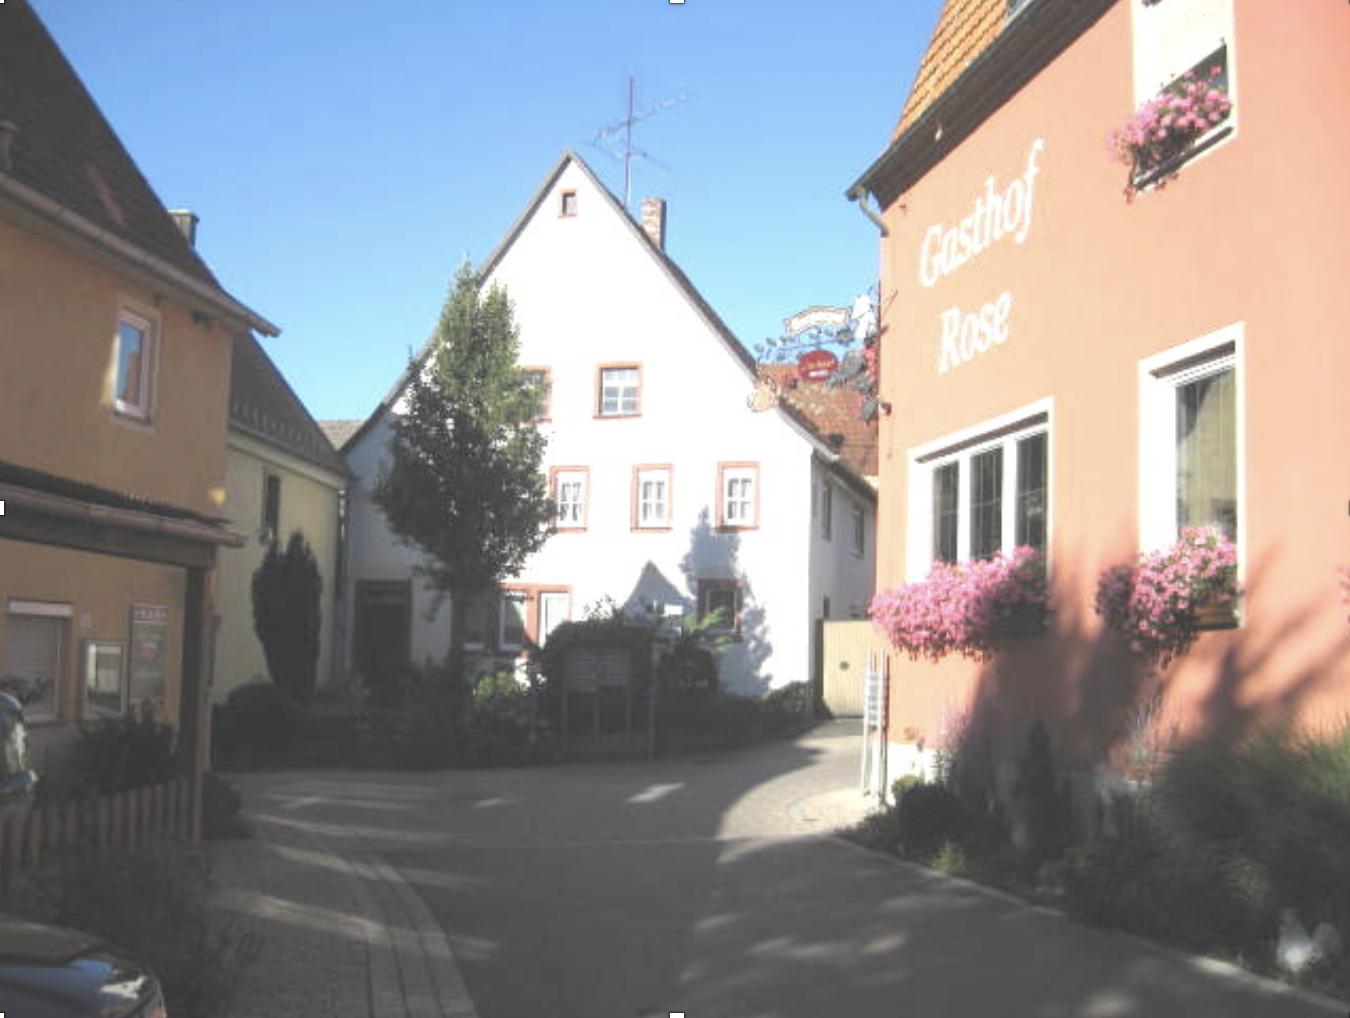 Central Germany, Obereisenheim, Nuernberg, Franconian countryside, Franks, Roman Empire